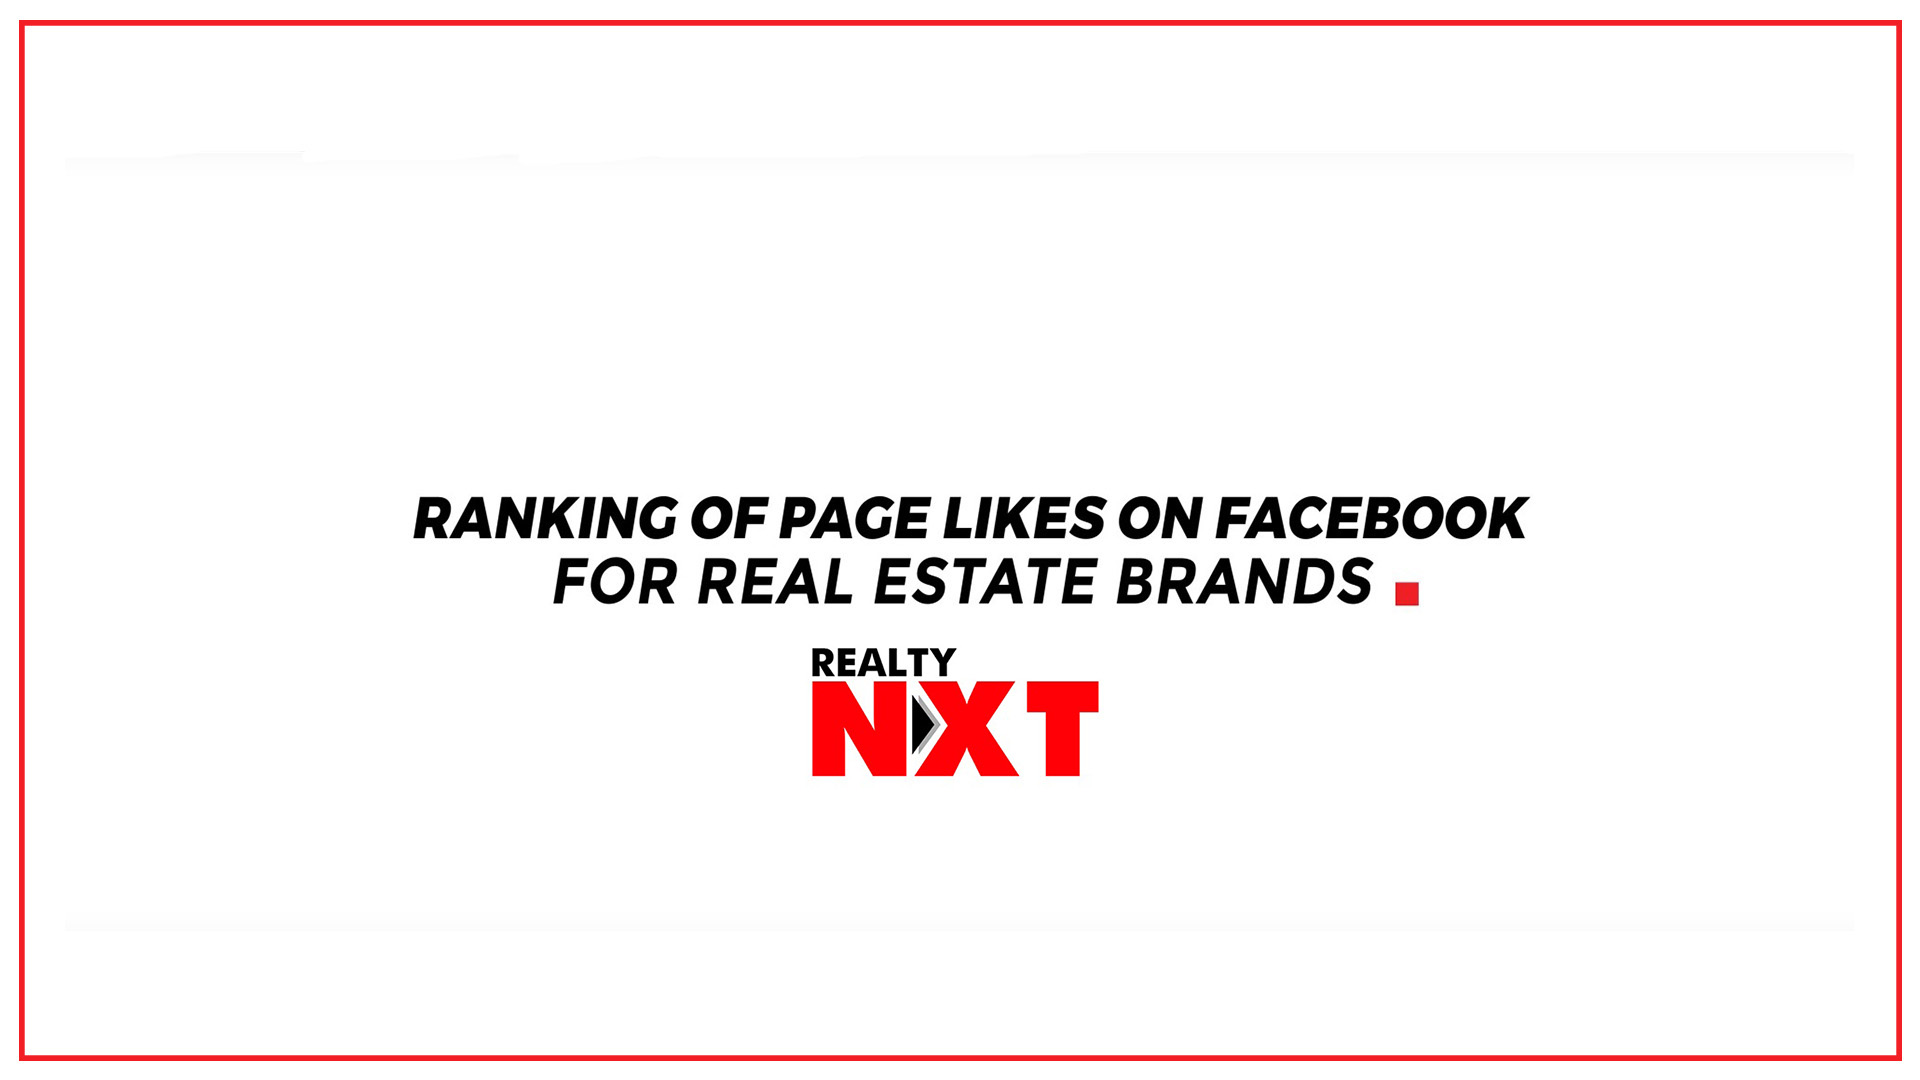 Top 10 Real Estate Brands on Social Media 2017